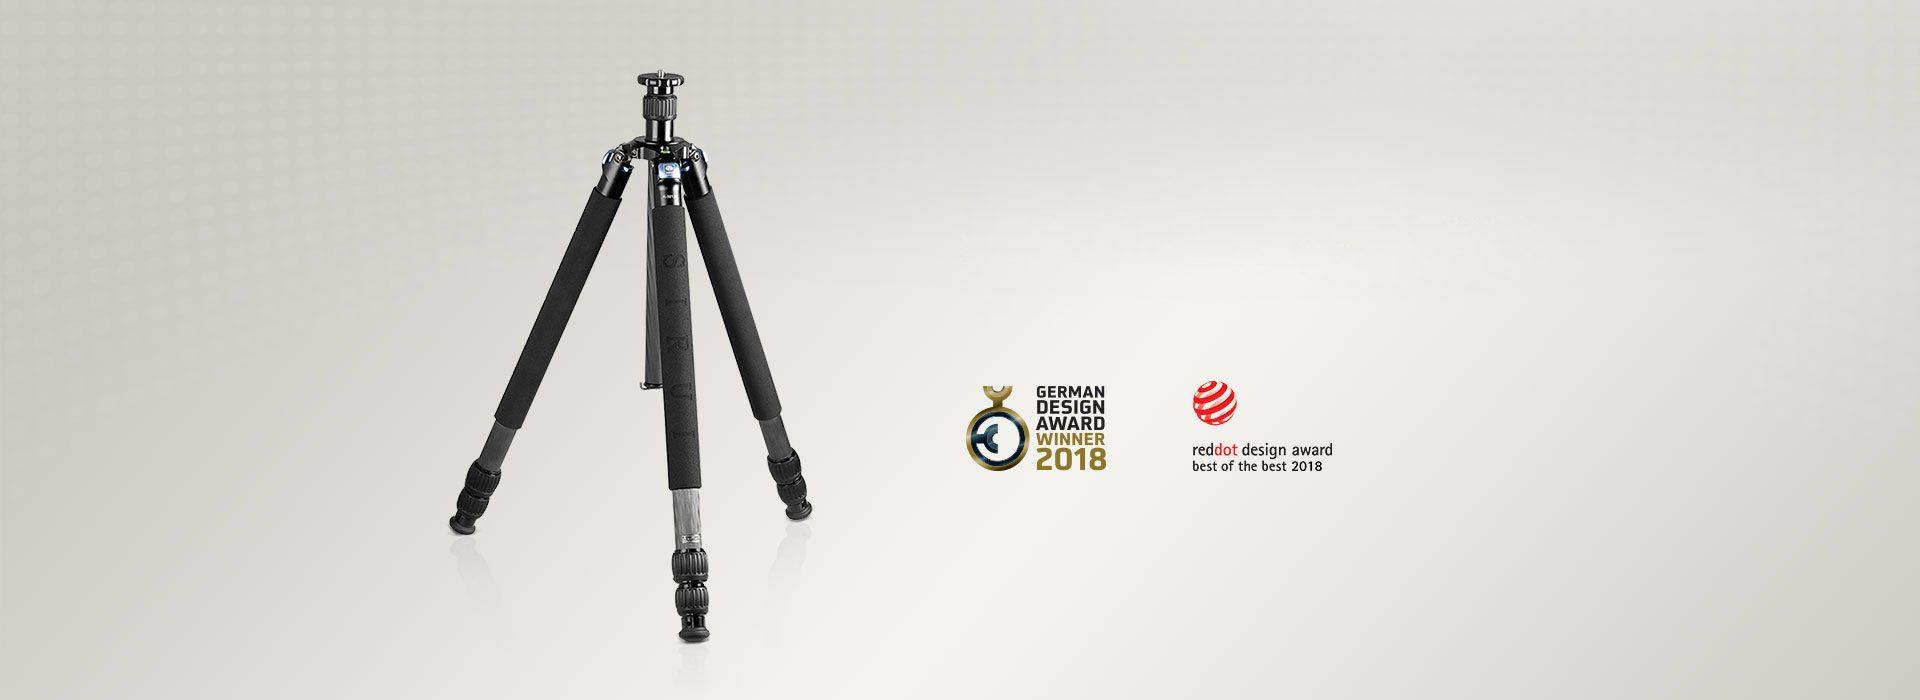 R-3213X 최대지지하중 30kg, 최대높이 263cm인 RX 시리즈 삼각대는 대형 카메라 및 장망원 렌즈를 사용하는 프로사진가와 아마추어 모두에게 적합한 삼각대입니다.